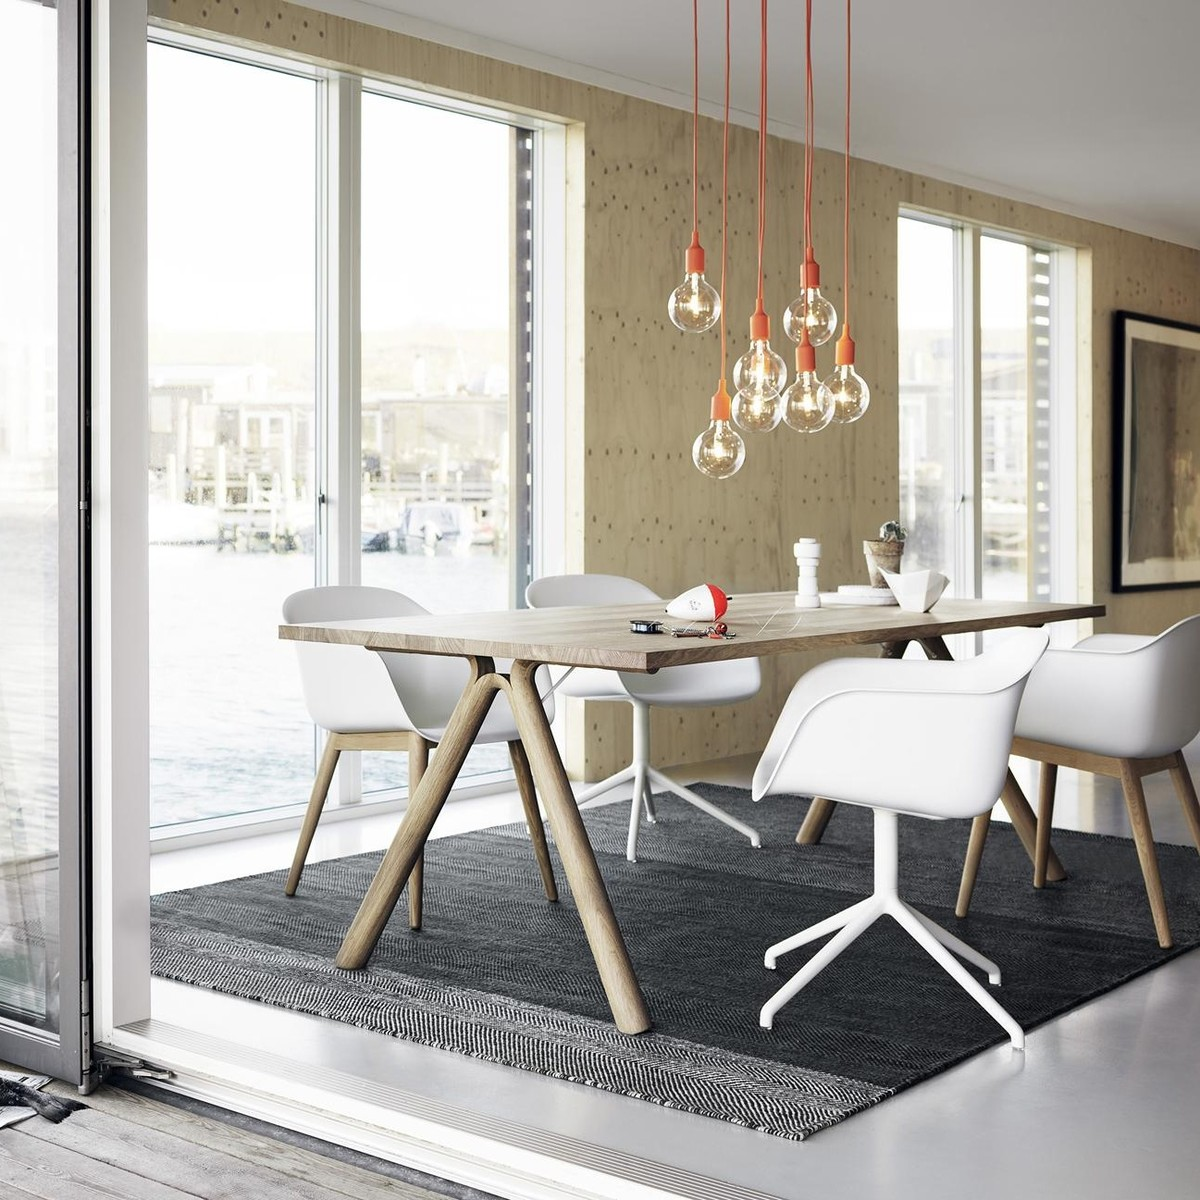 Fiber Chair Armlehnstuhl Mit Holzgestell Muuto